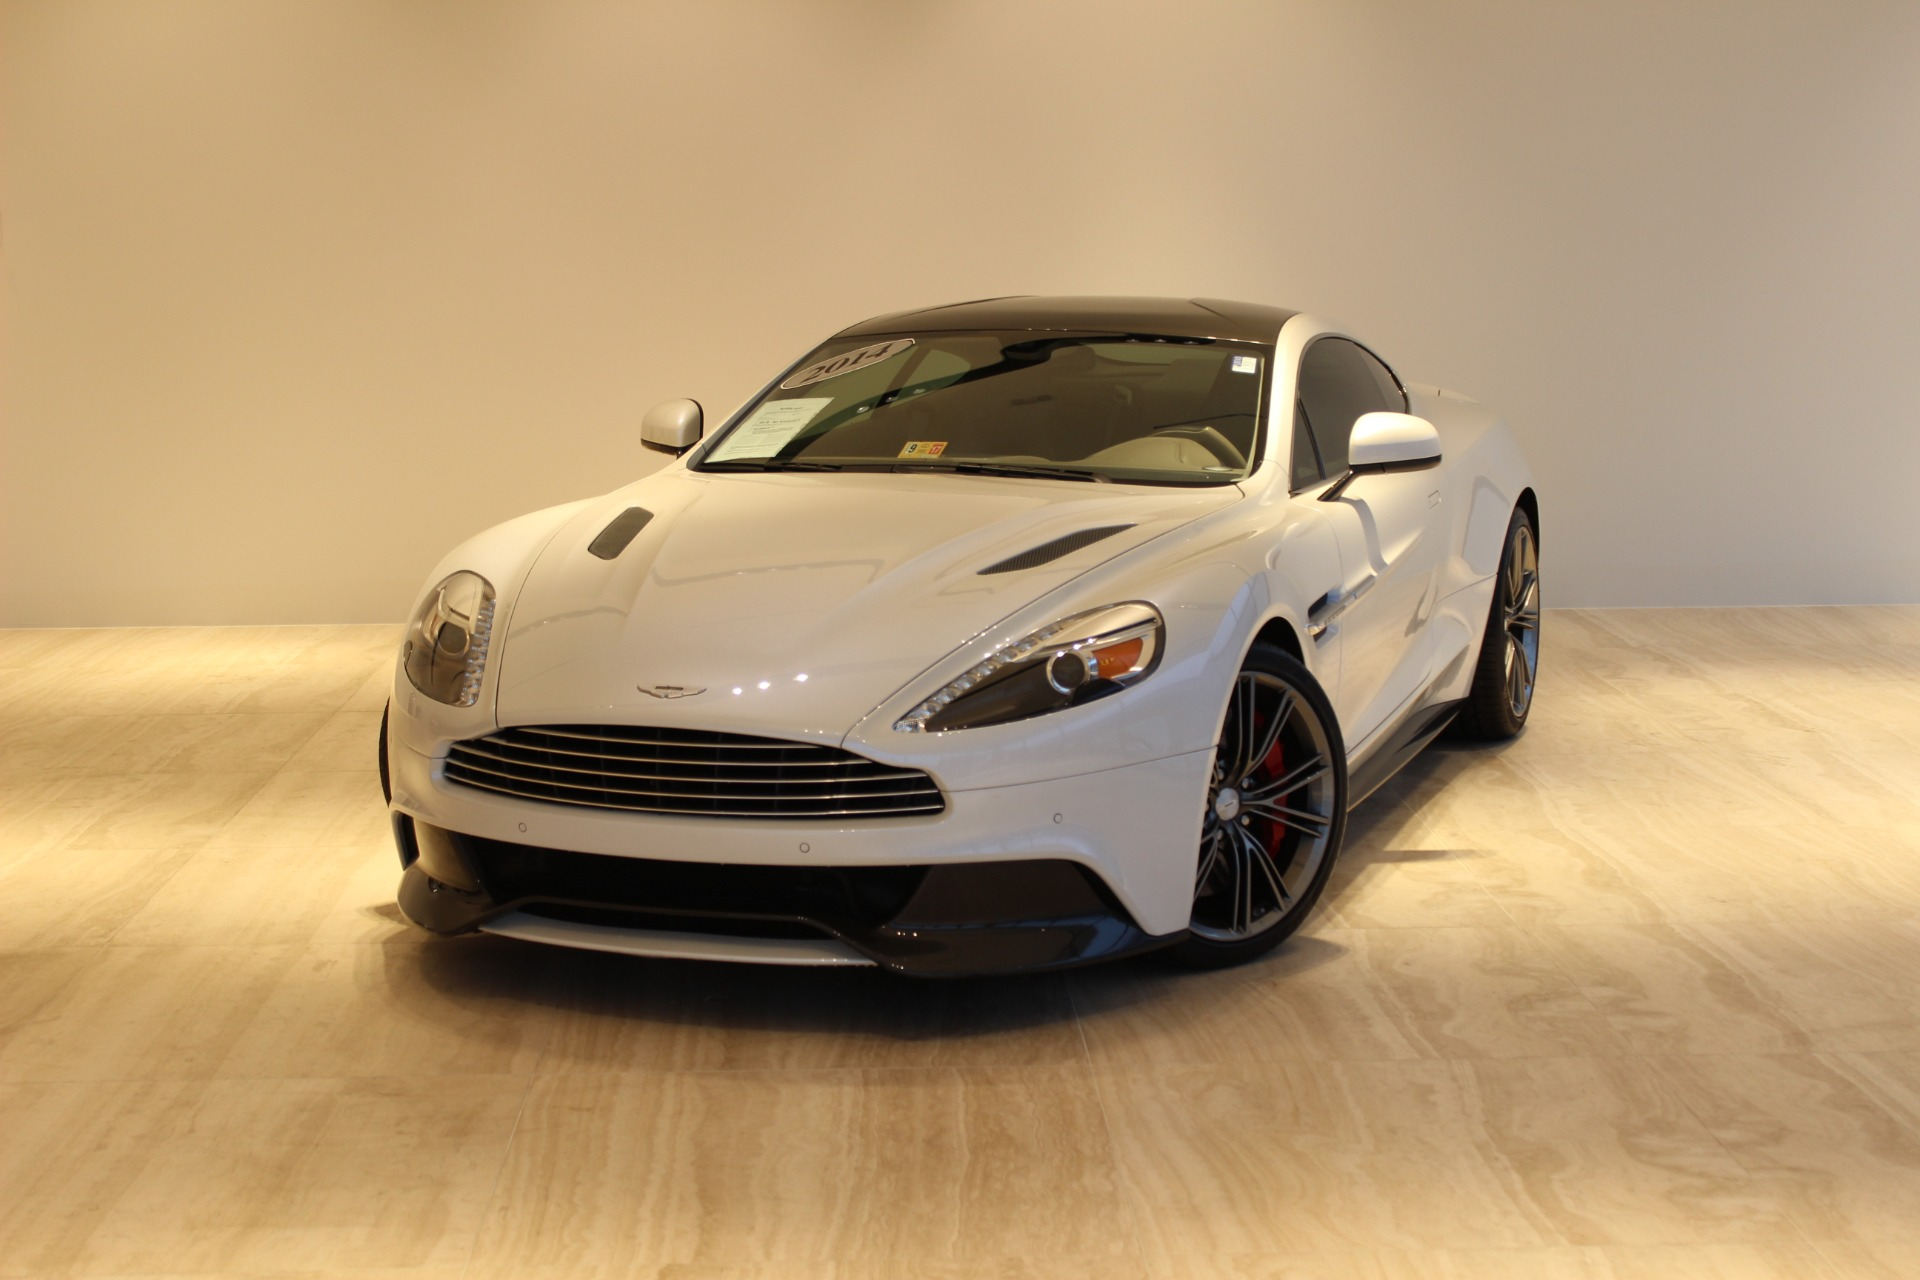 2014 Aston Martin Vanquish Stock # PJ00703 for sale near Vienna, VA ...